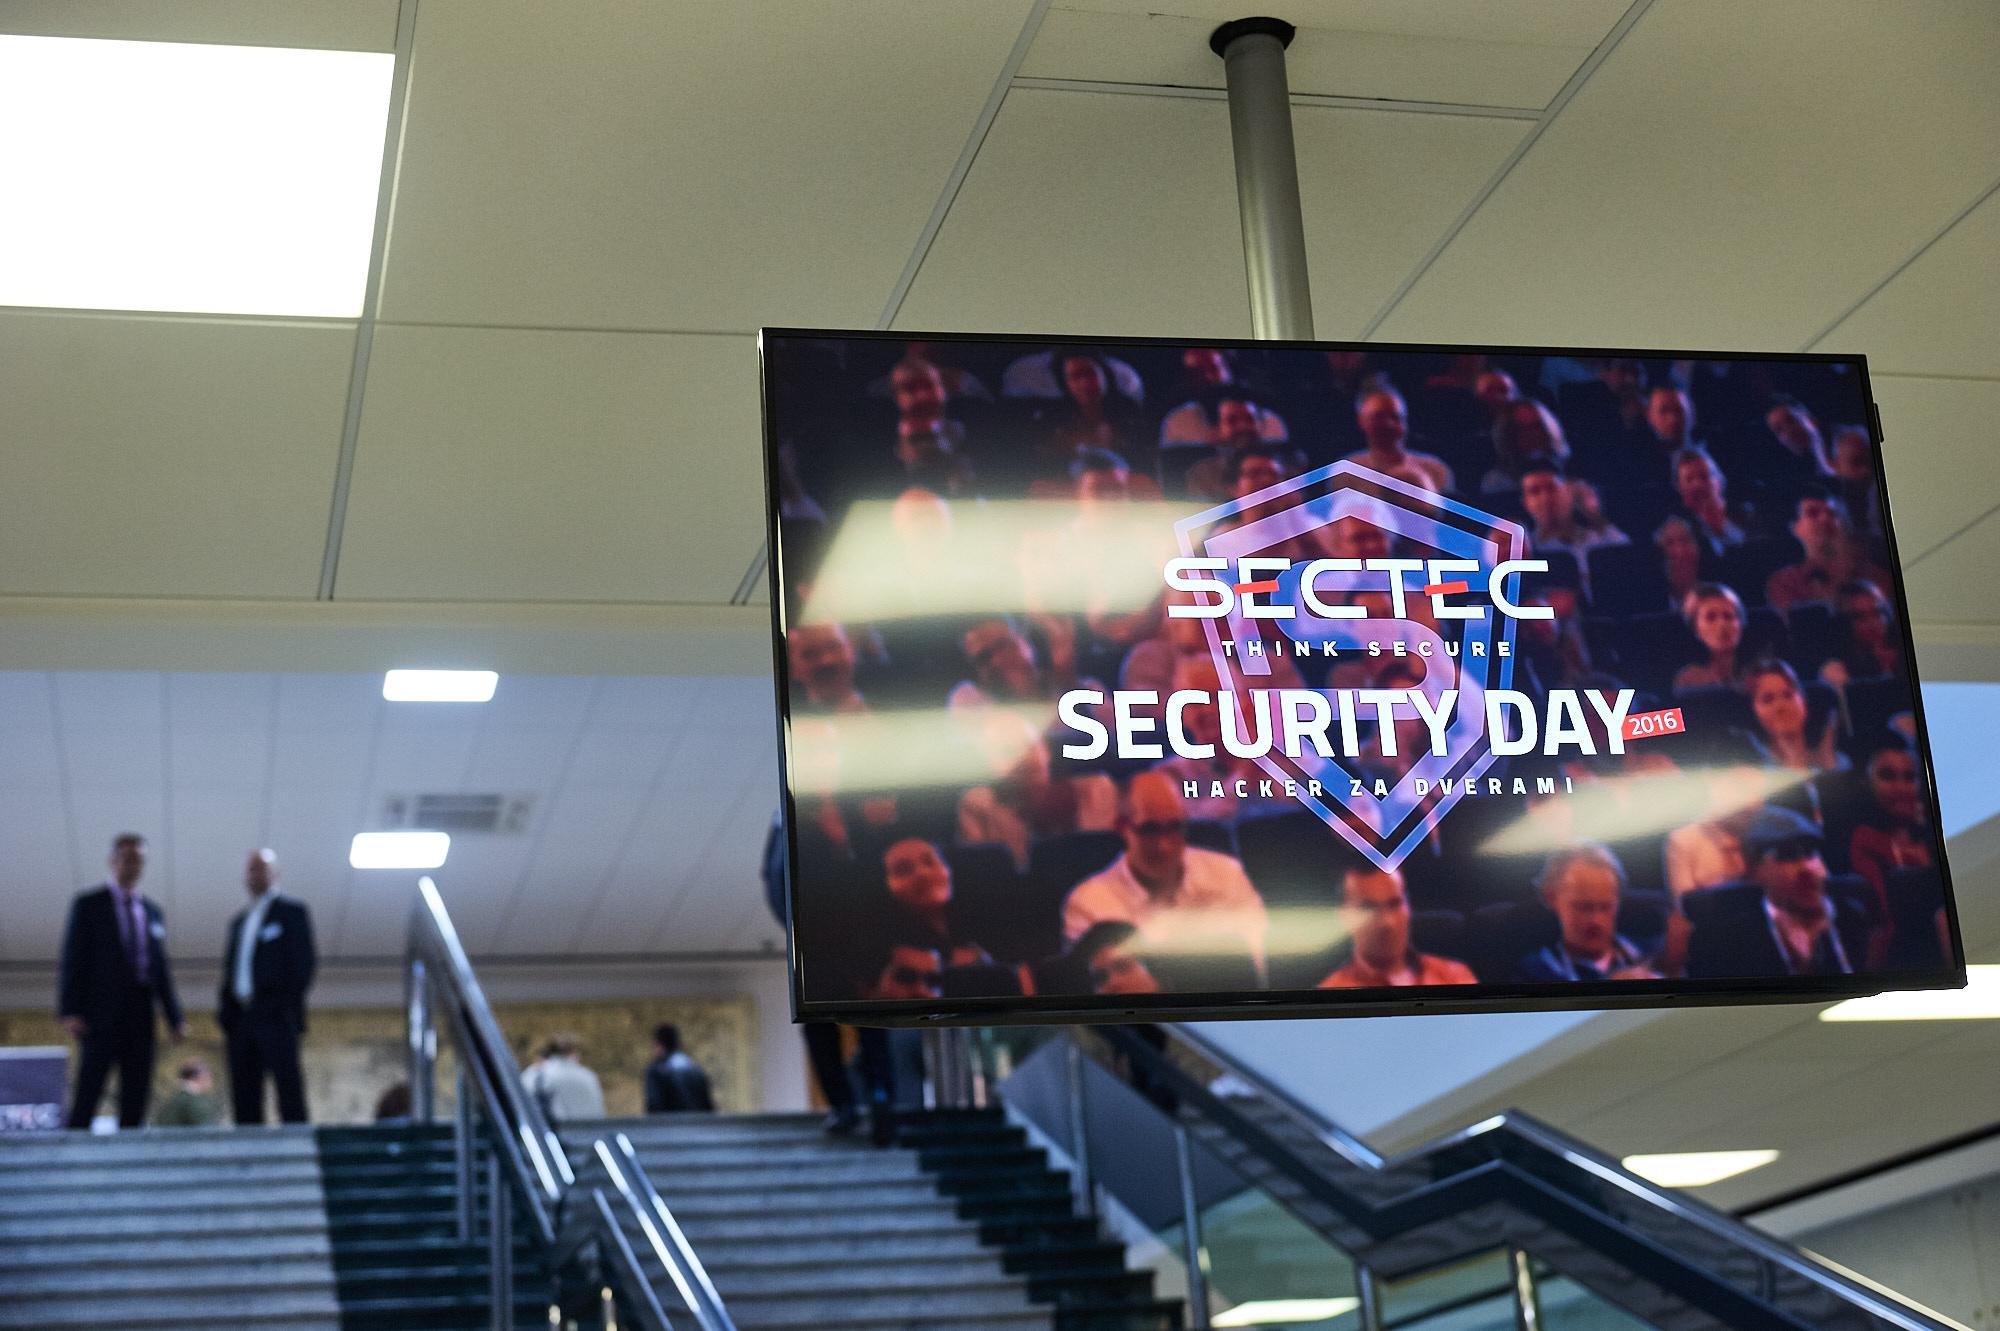 SecTec Security Day 2016 – Hacker za dverami